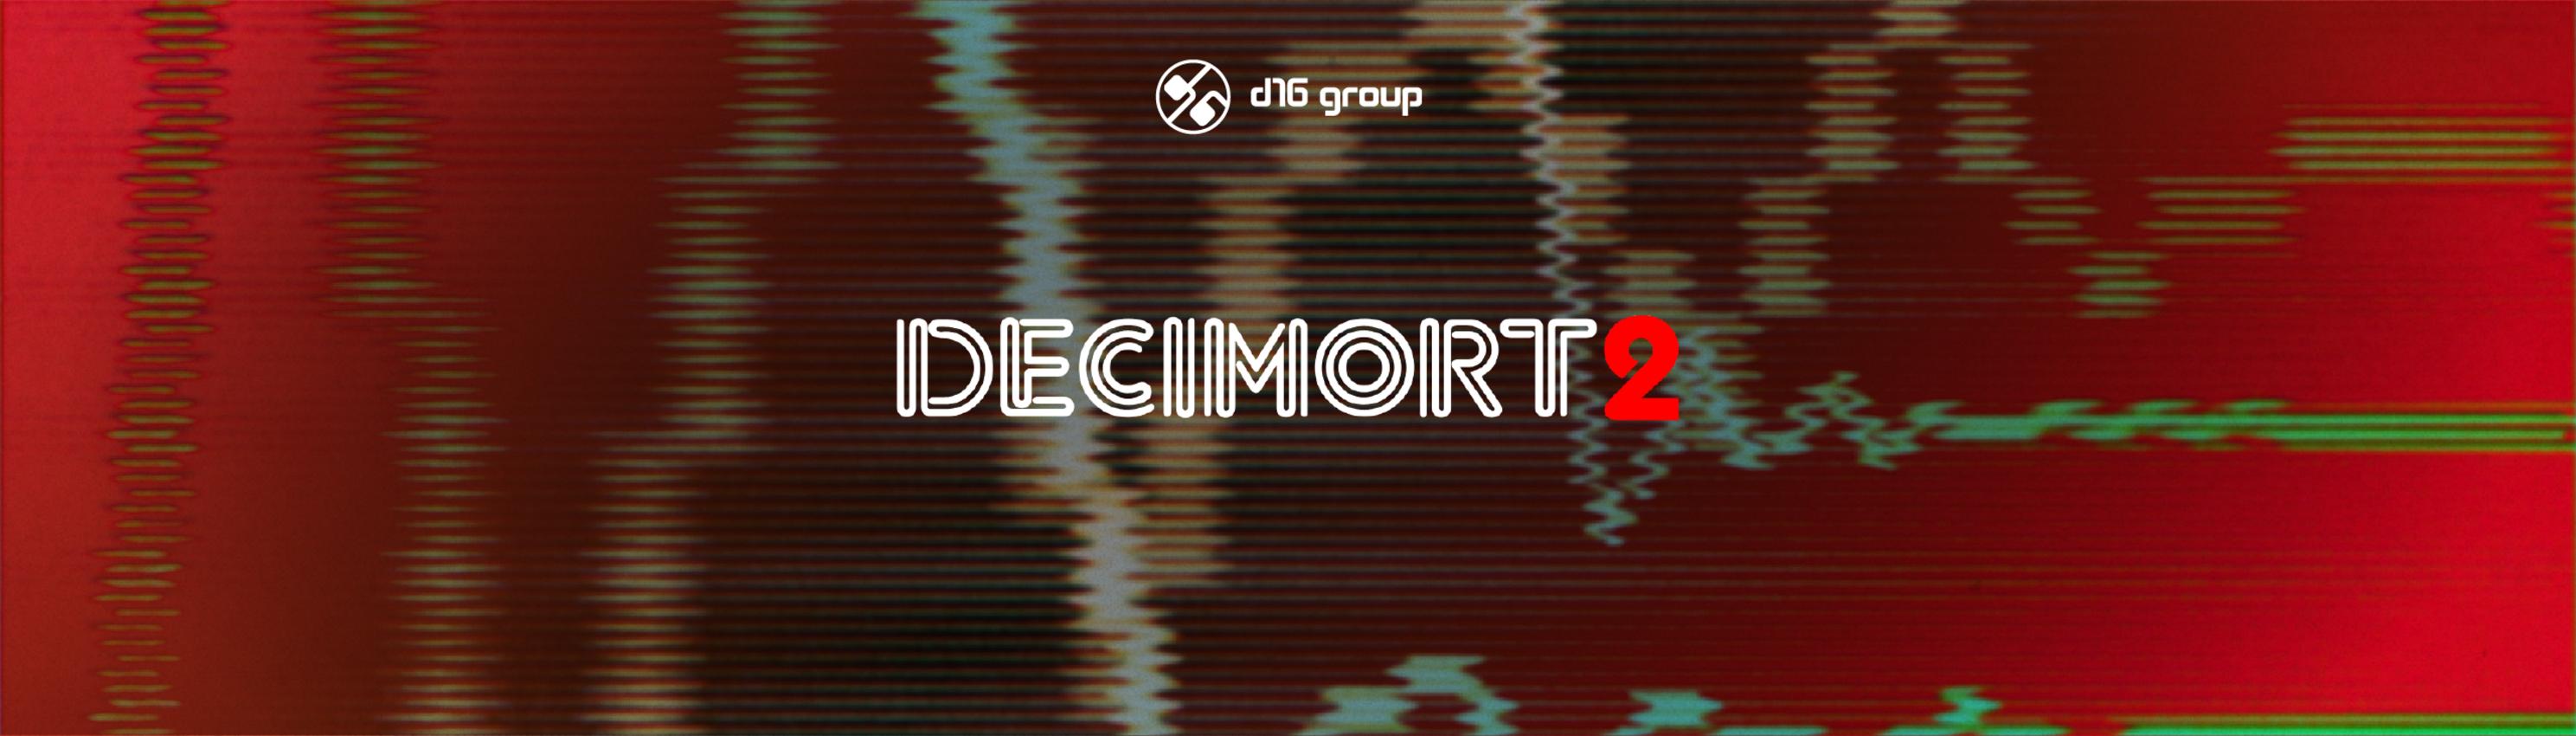 Decimort Header